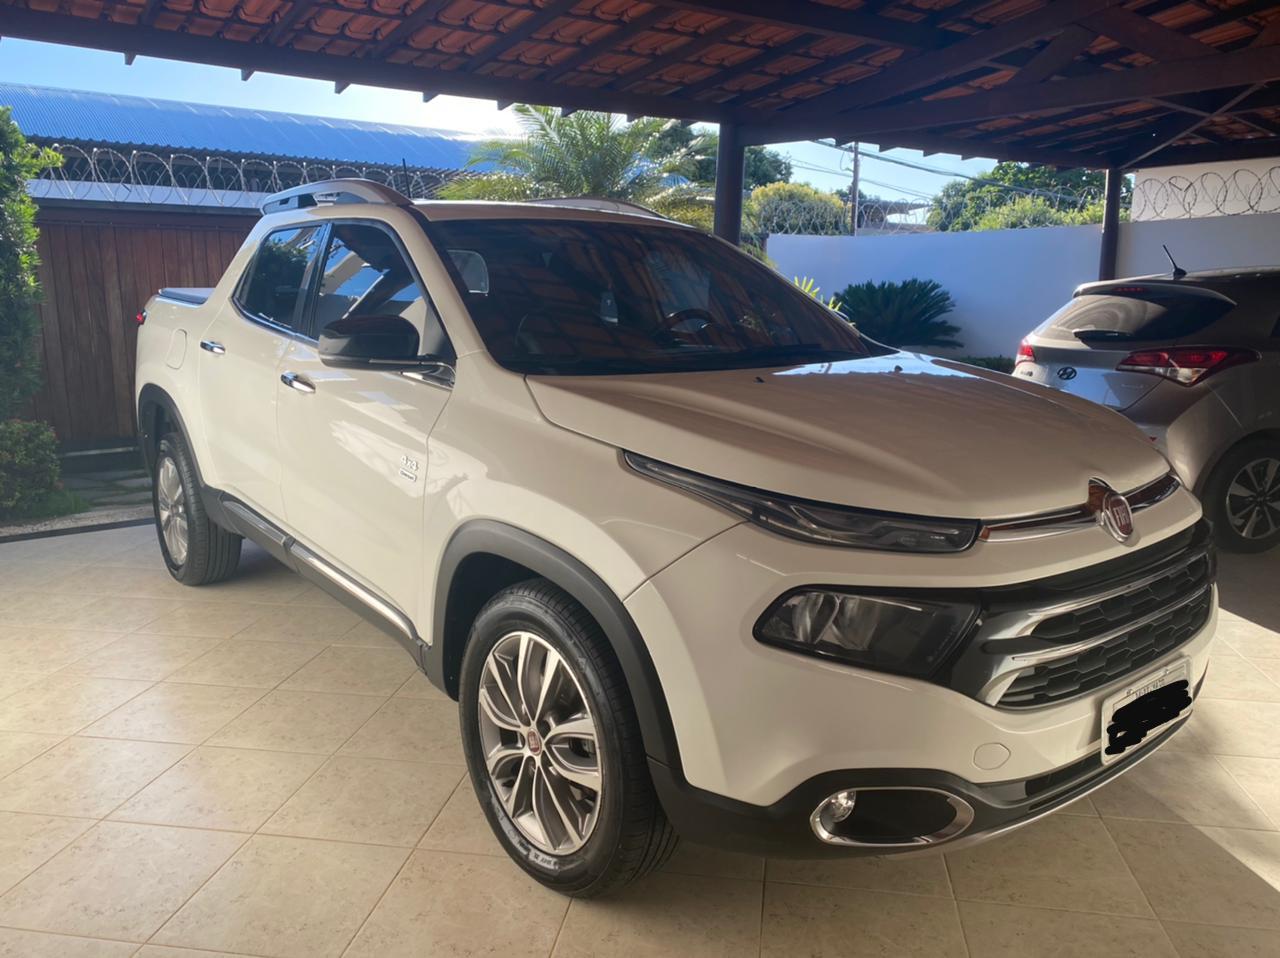 Oportunidade: Fiat Toro à venda